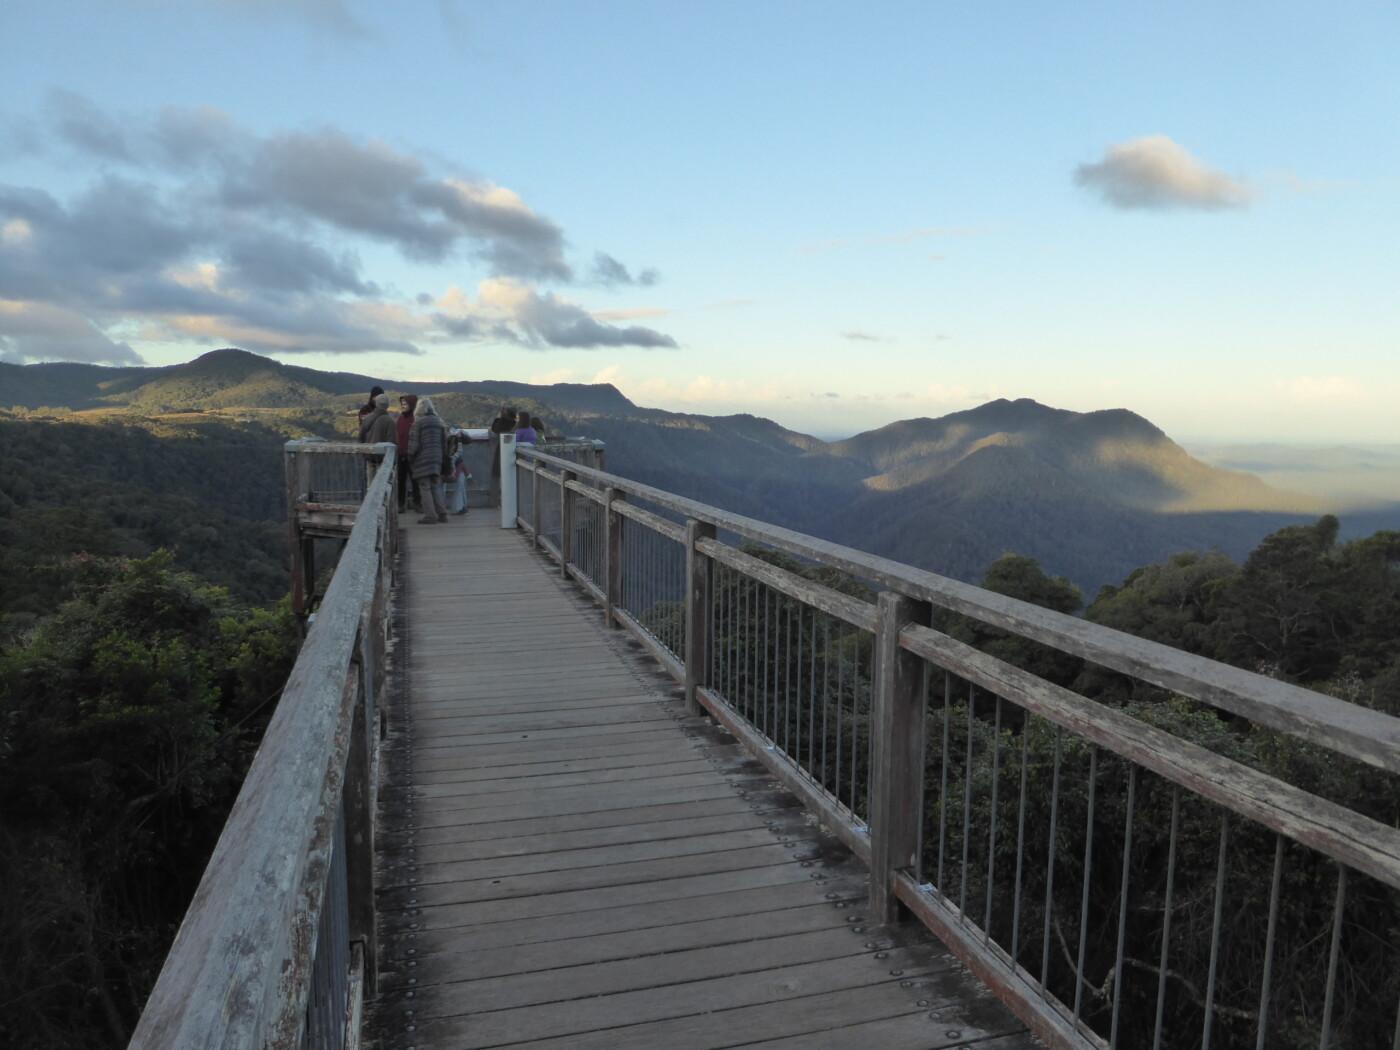 Dorrigo skywalk 2021